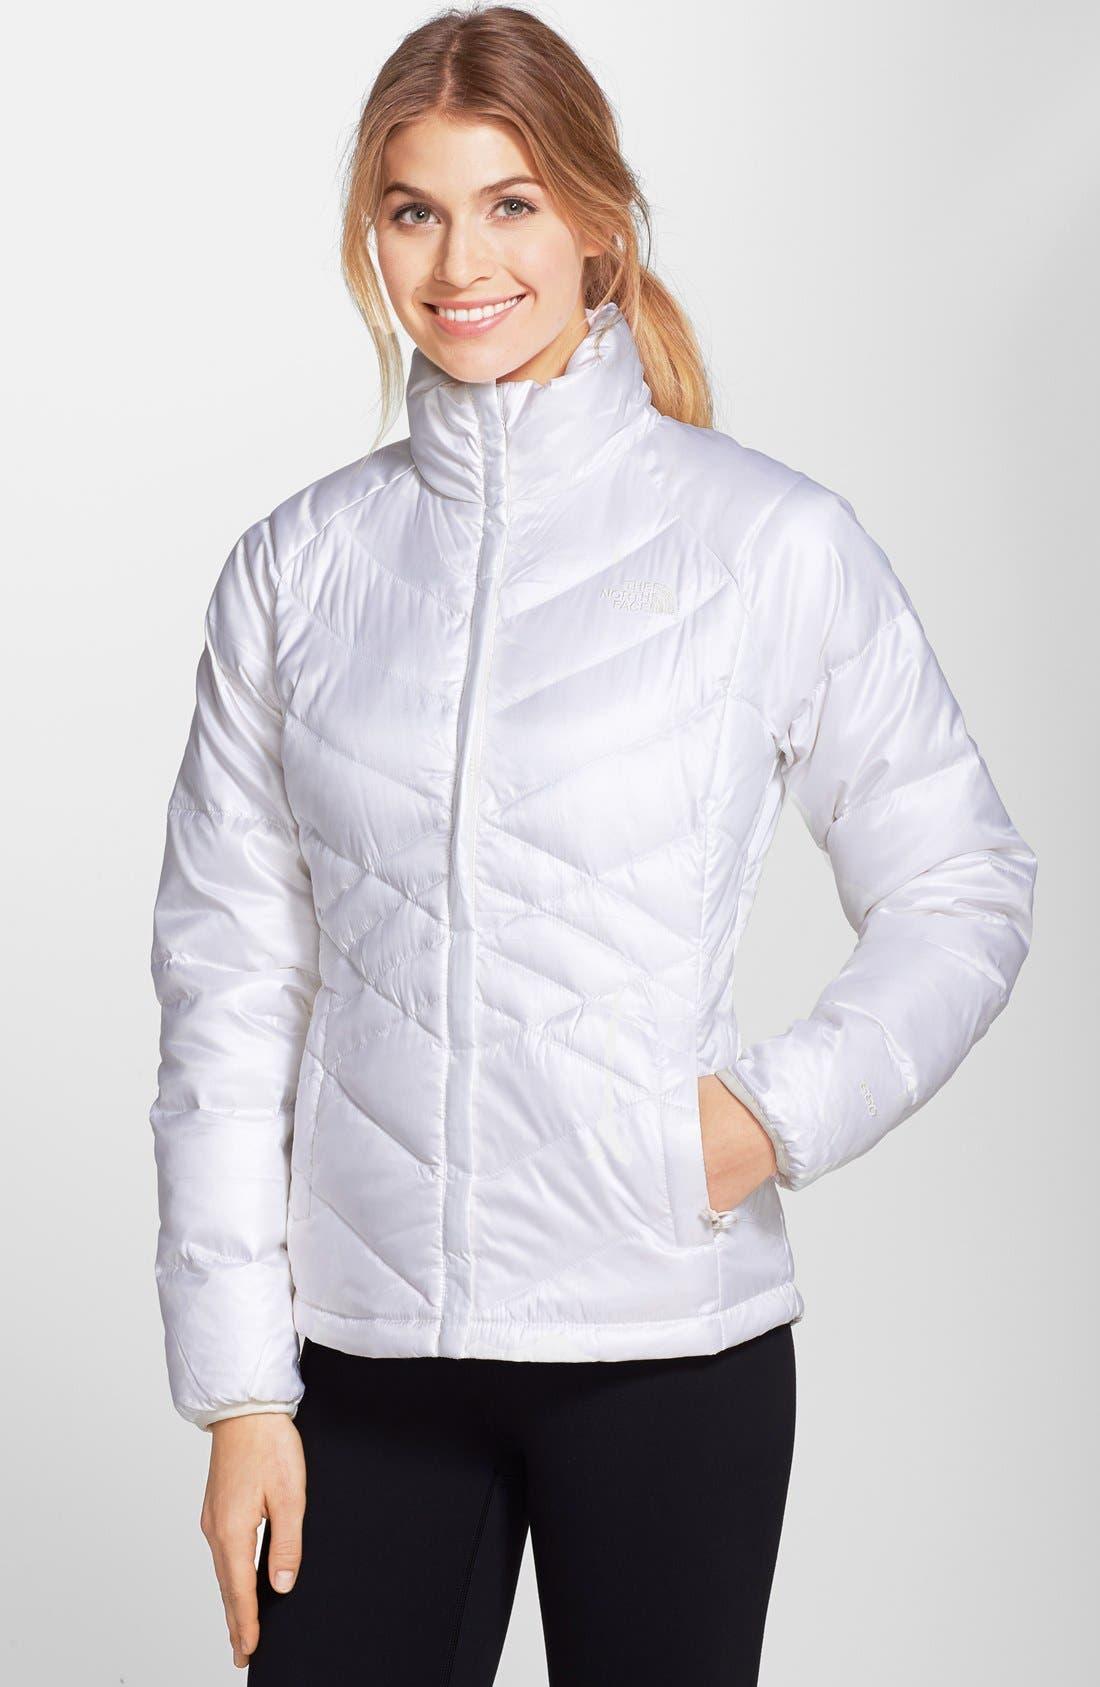 Main Image - The North Face 'Aconcagua' Jacket